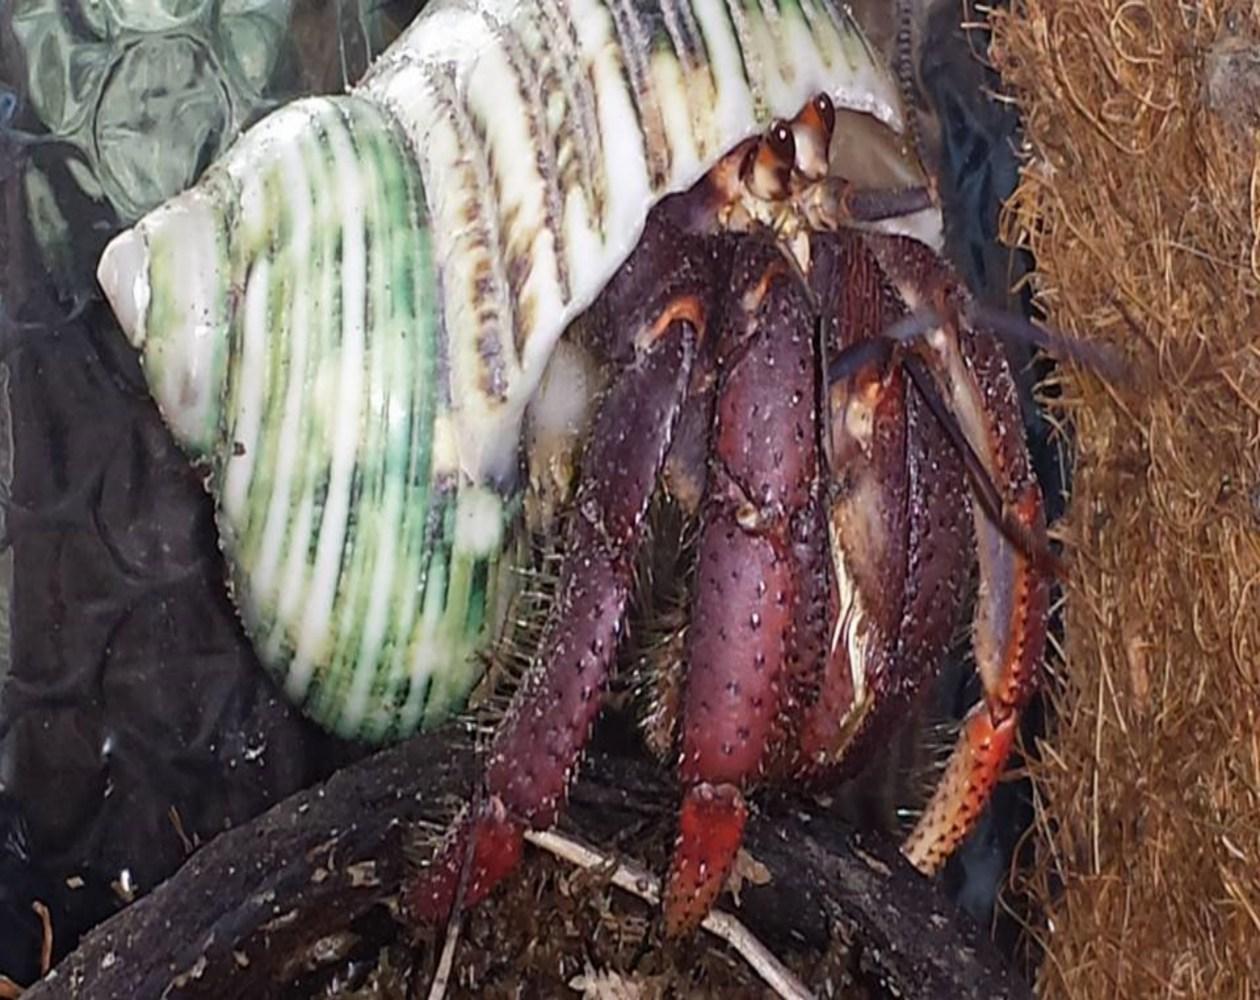 Lulu - December 2015 Calender Crab Entry